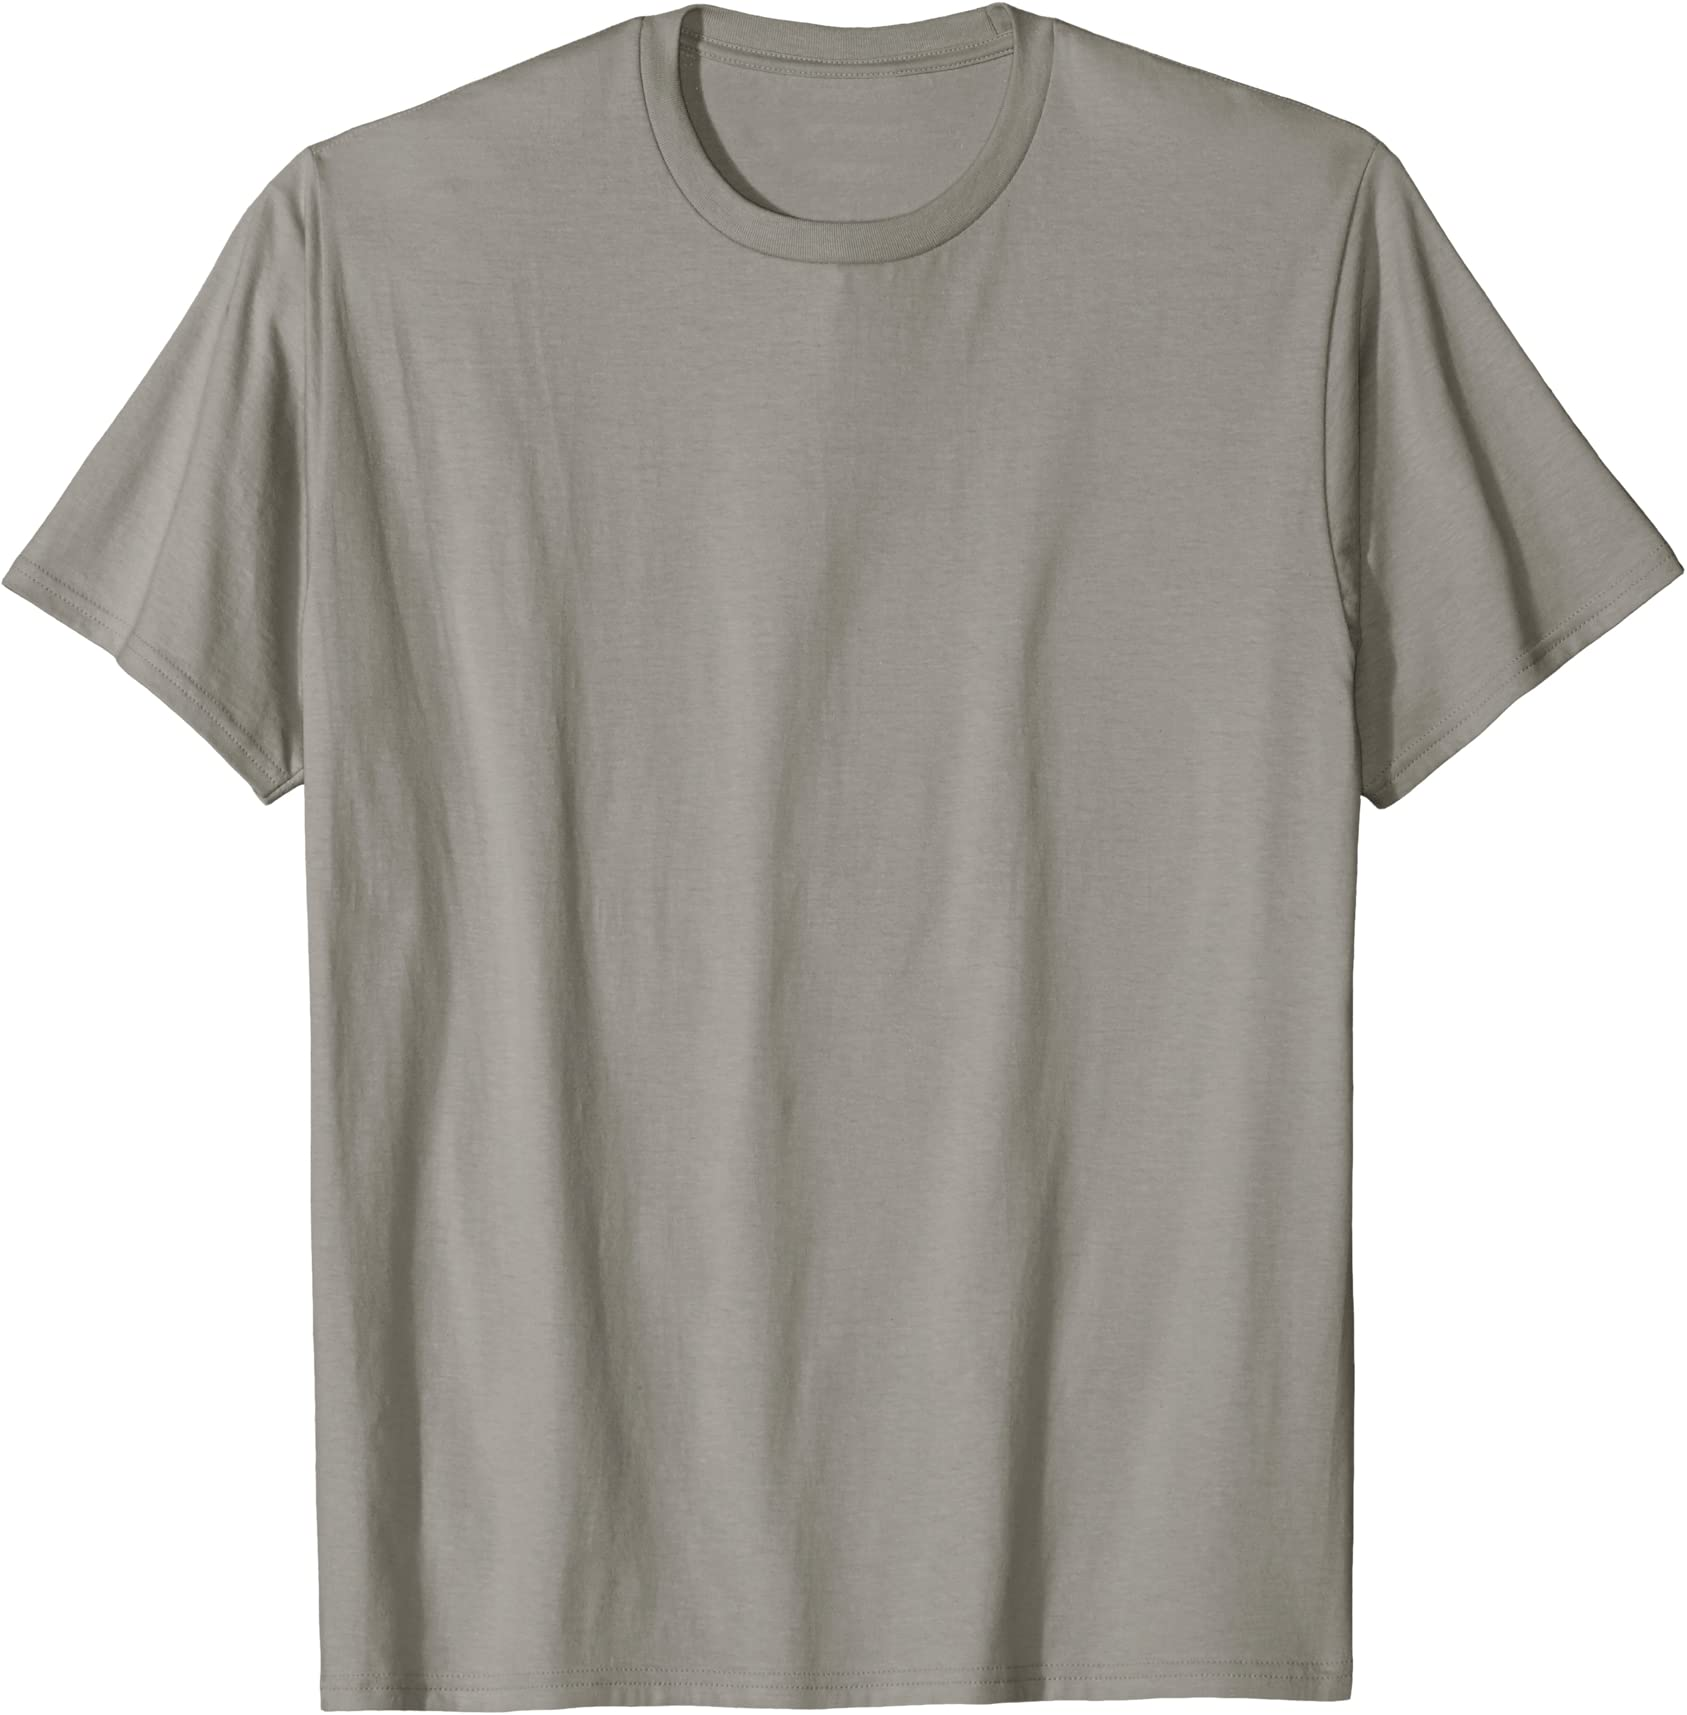 Reel Girls Like Big Rods Funny Fishing Outdoors Sayings Slogans Men/'s T-shirt